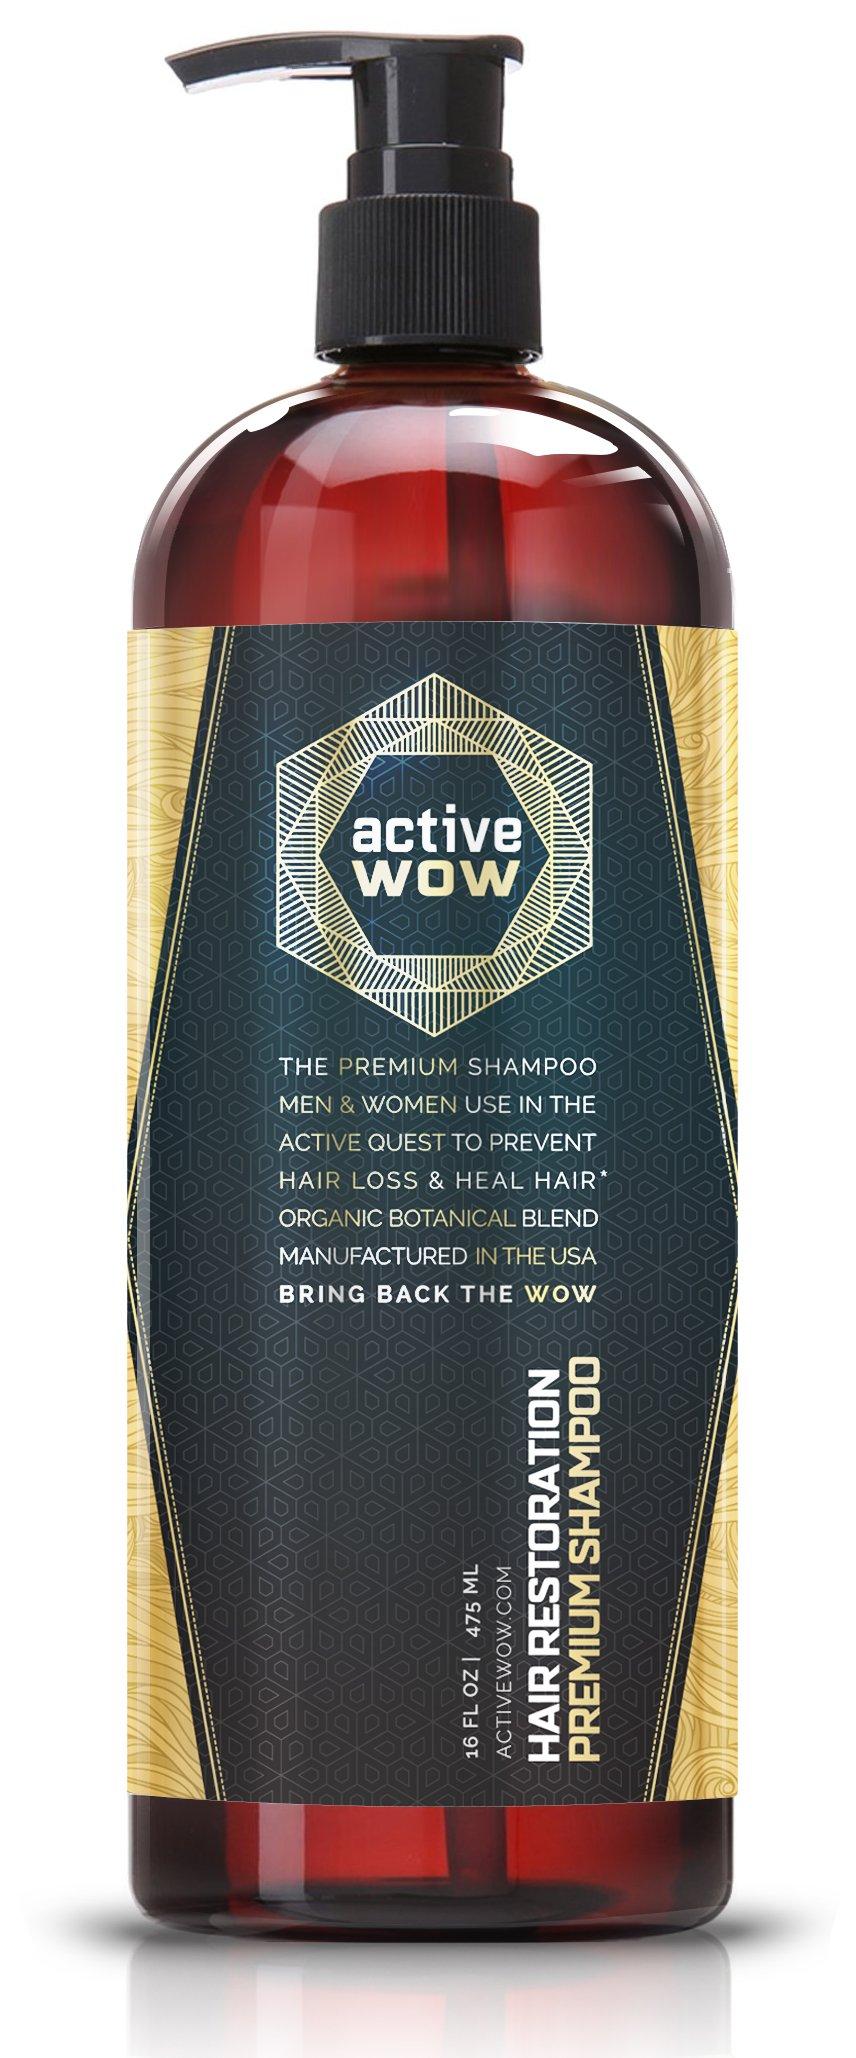 Active Wow Argan Oil & Organic Botanicals Anti Hair-Loss Shampoo - 16 Fluid Oz